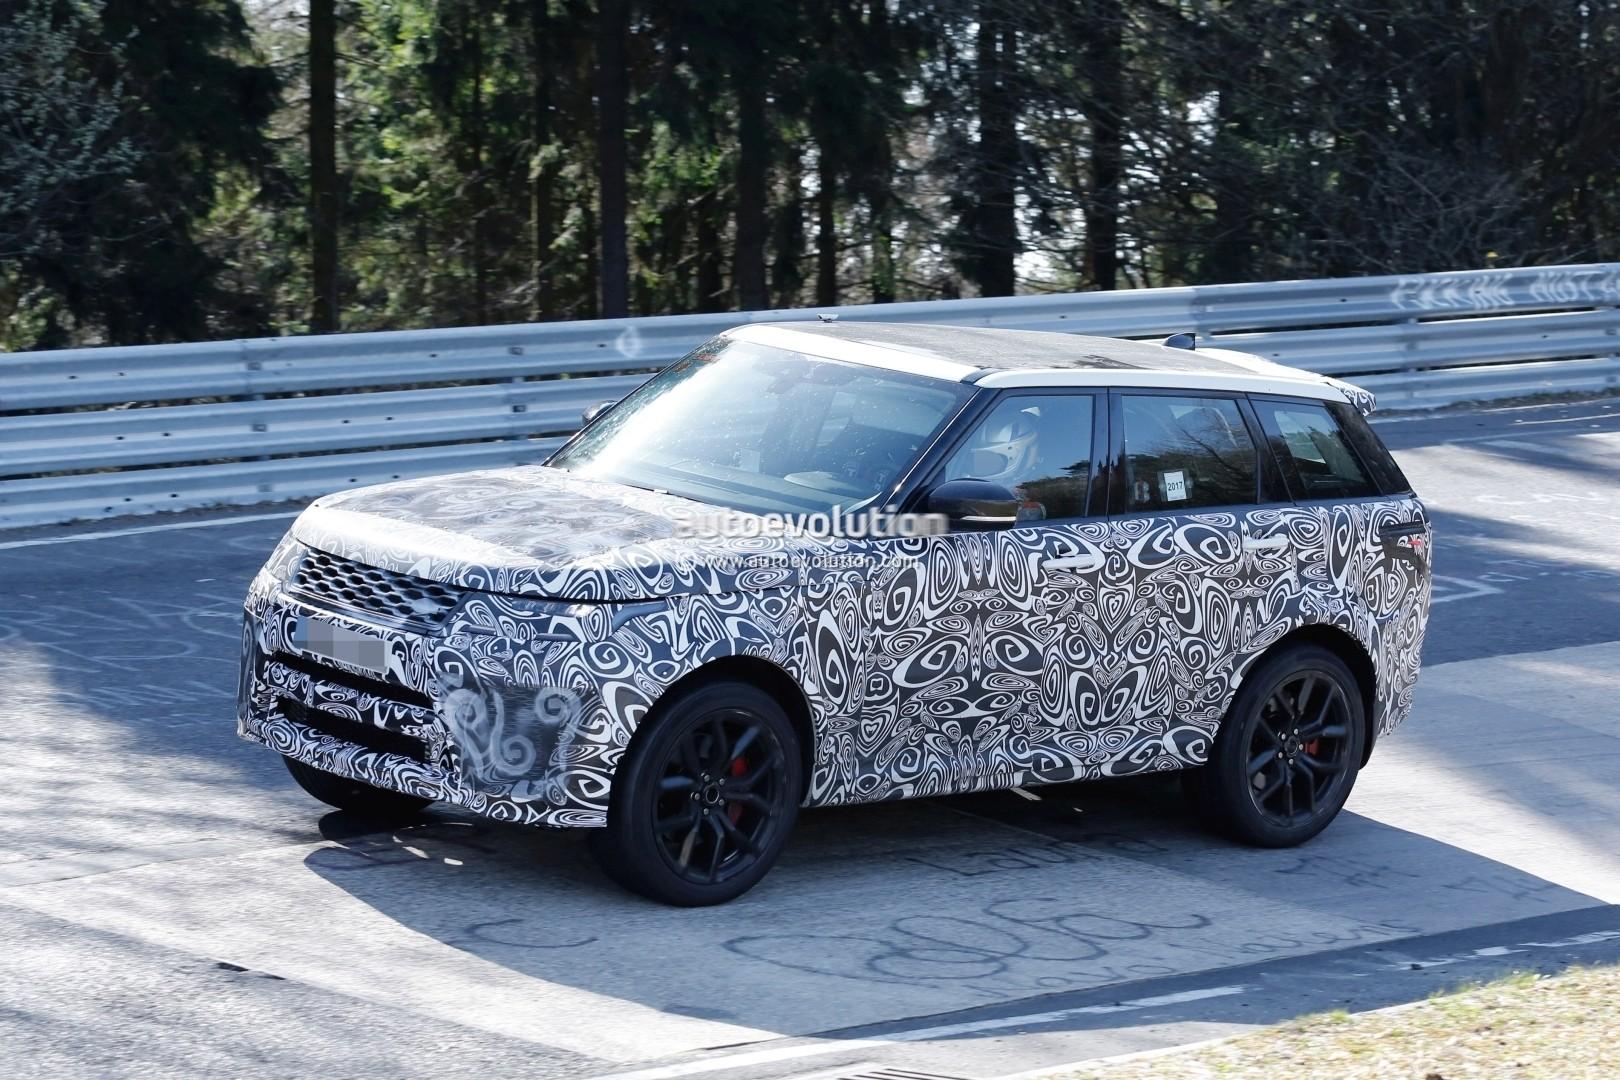 2018 range rover sport svr shows production lights exhaust tips on nurburgring autoevolution. Black Bedroom Furniture Sets. Home Design Ideas